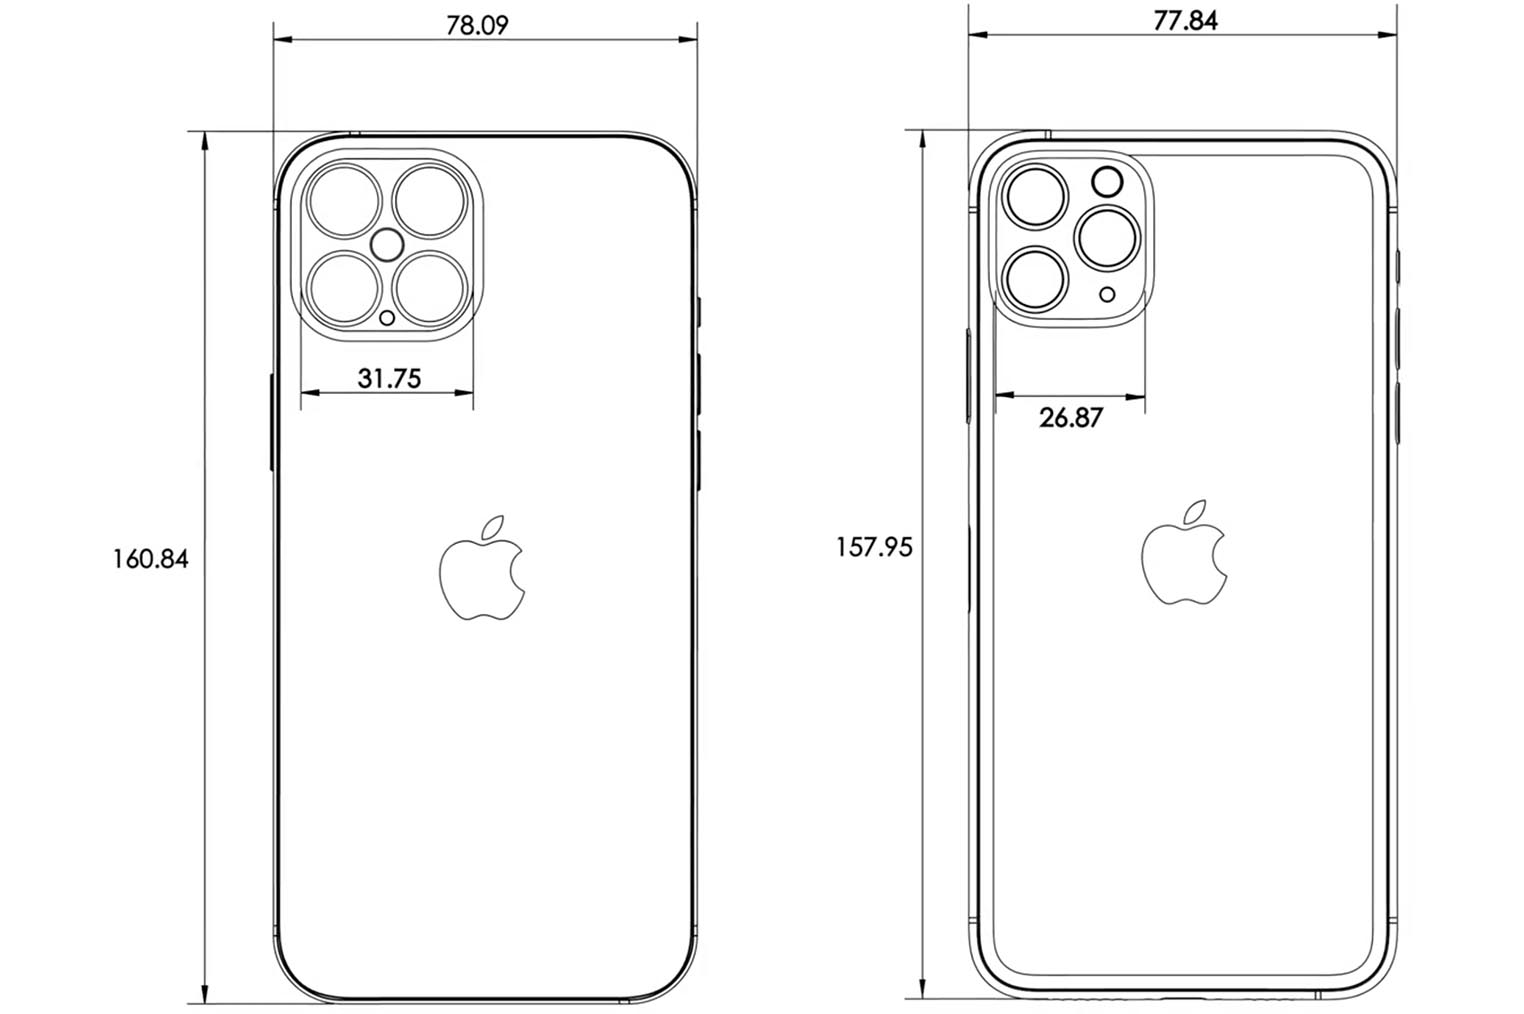 iPhone 12 Pro Max dimensions